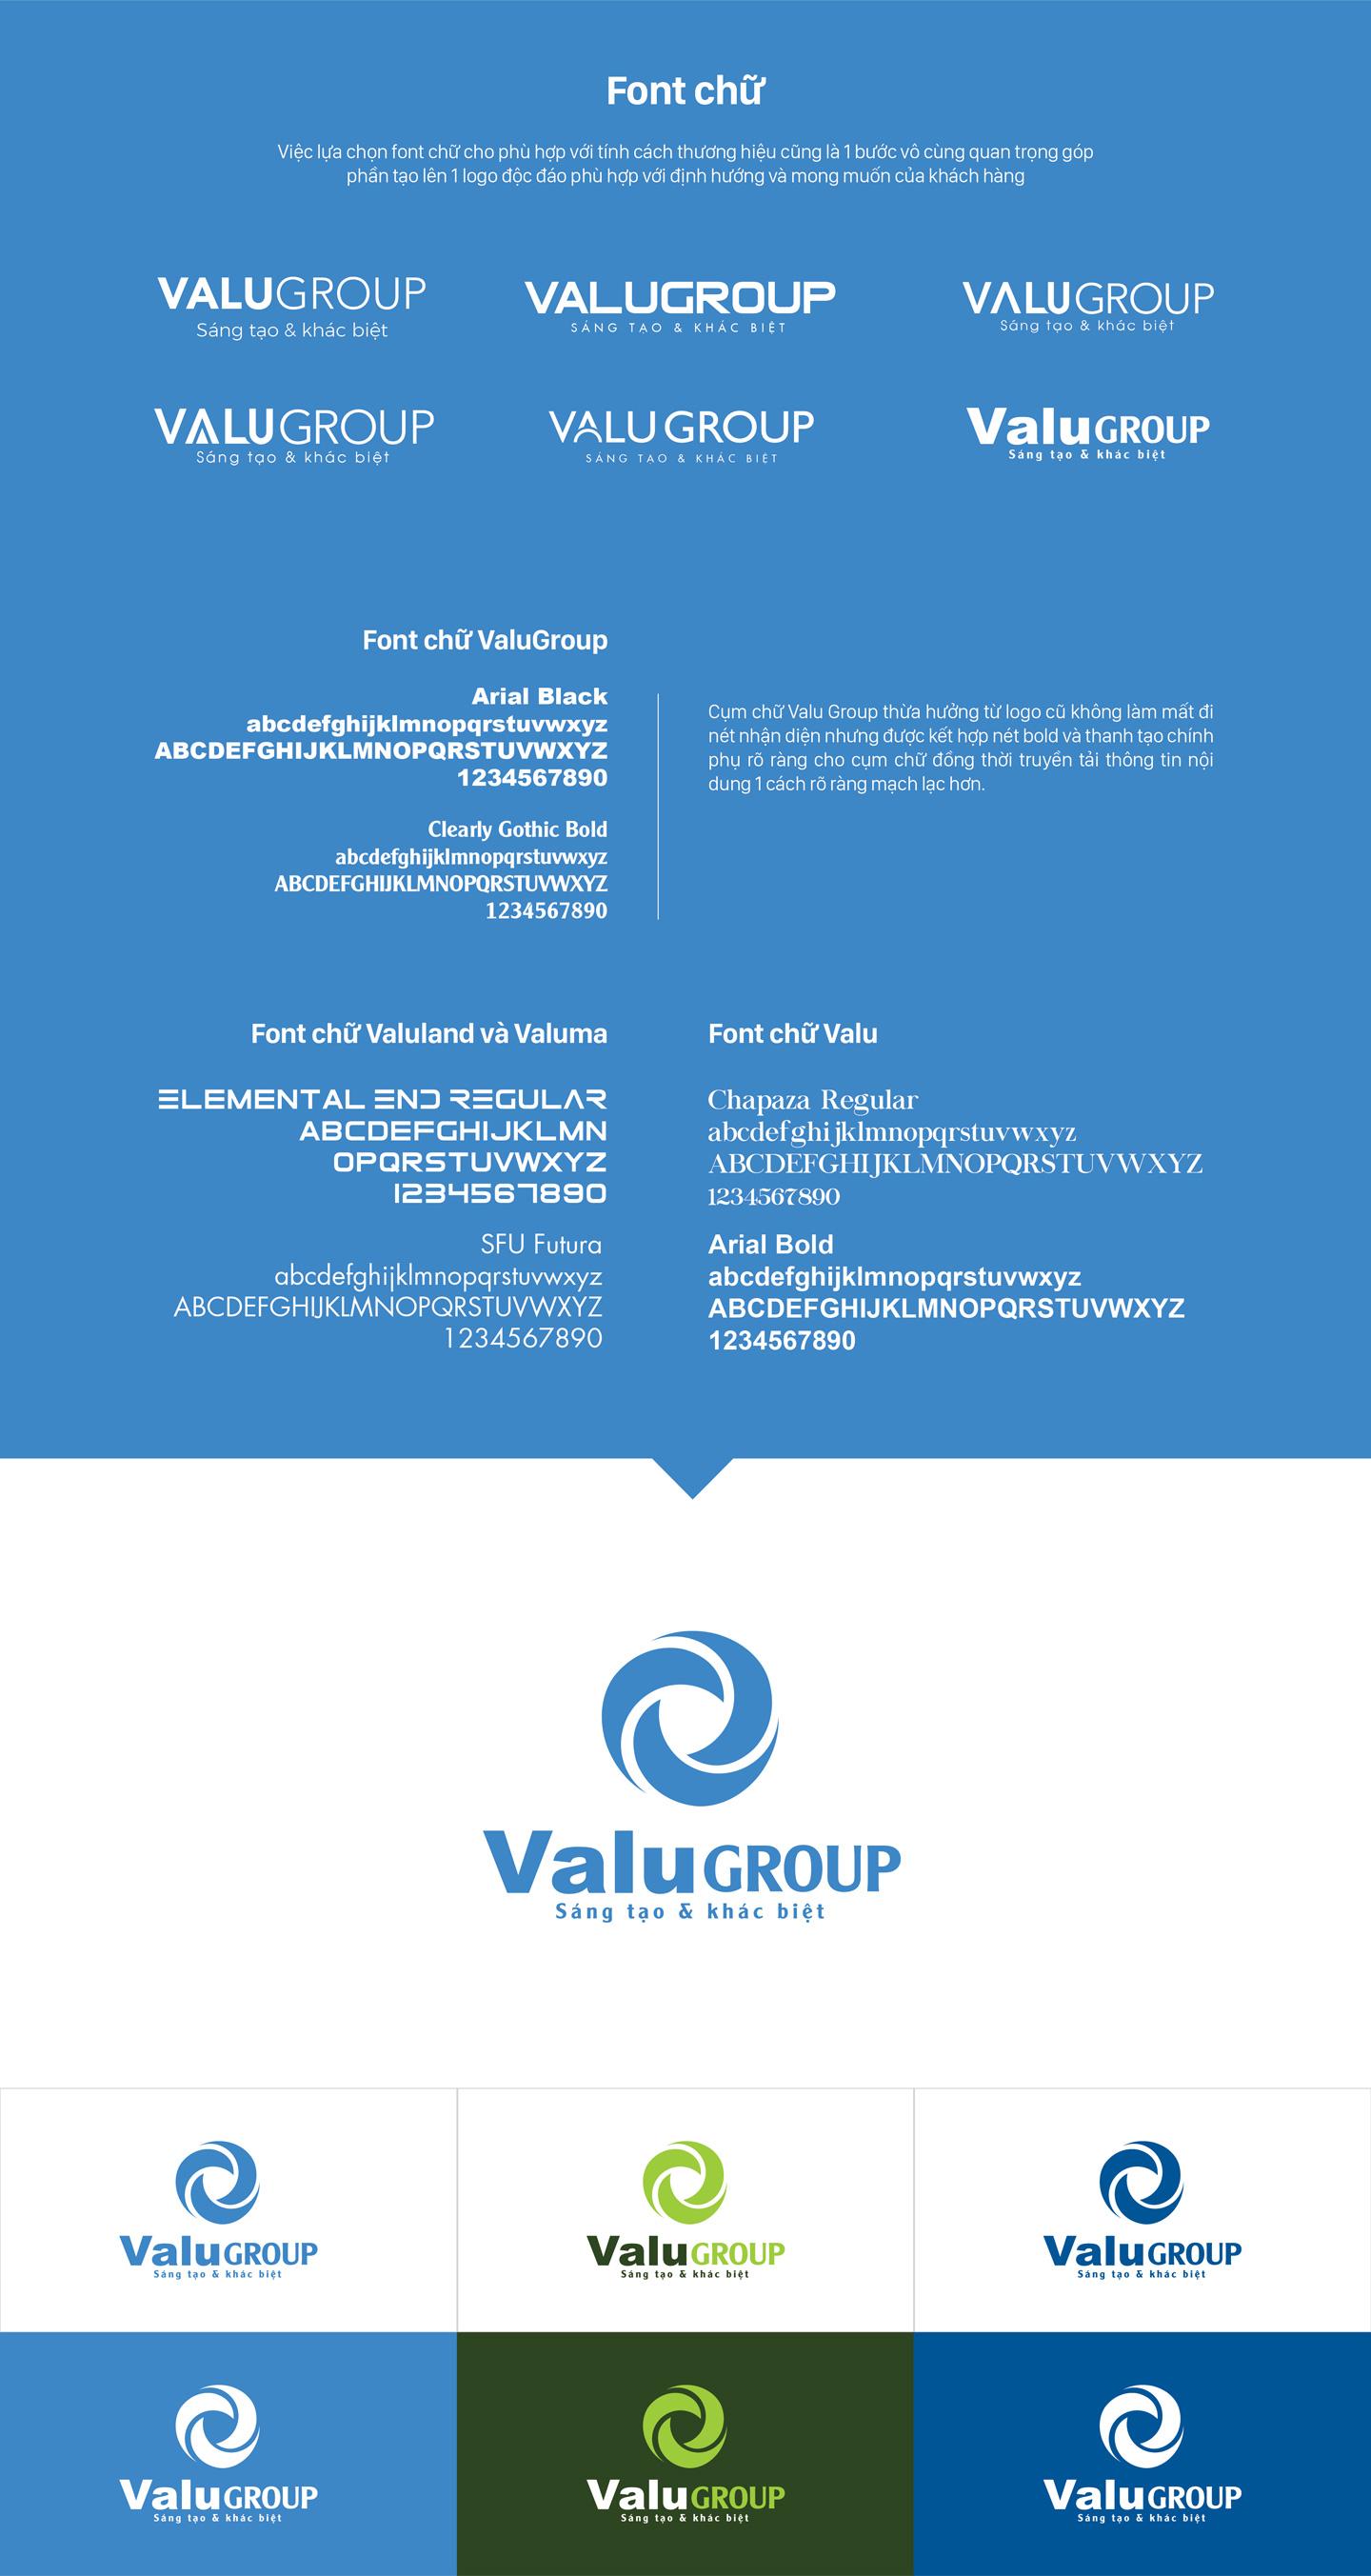 Valu-showcase1-05